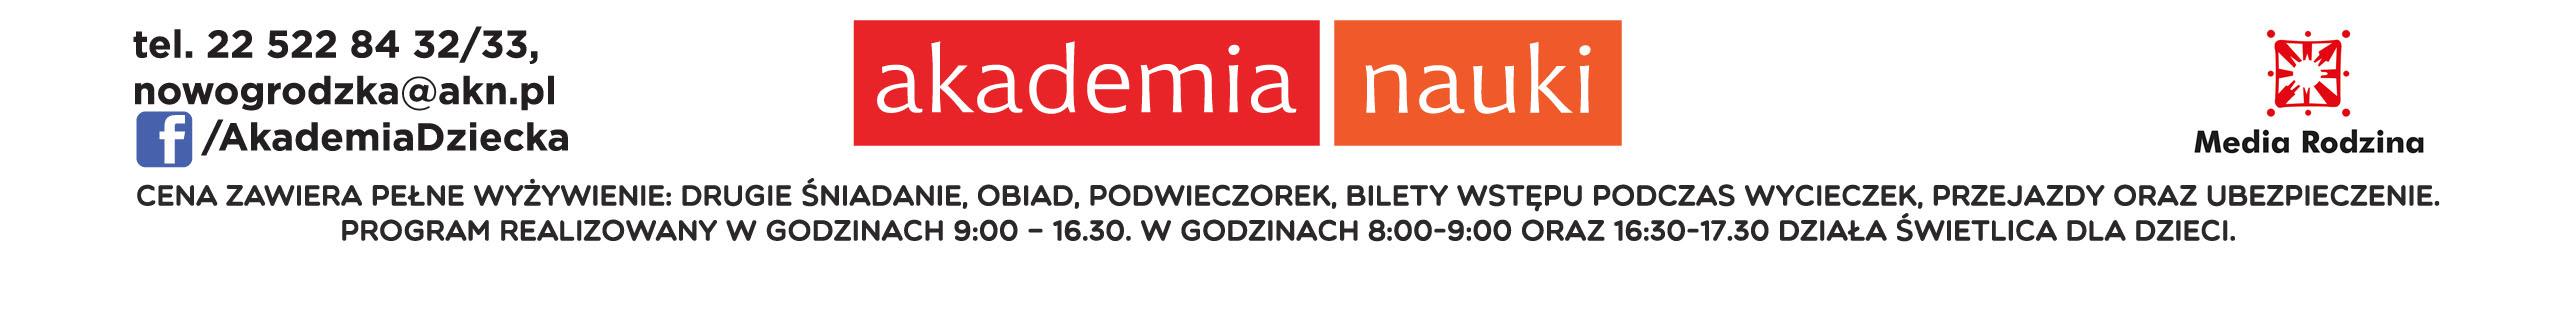 akademia nauki Warszawa